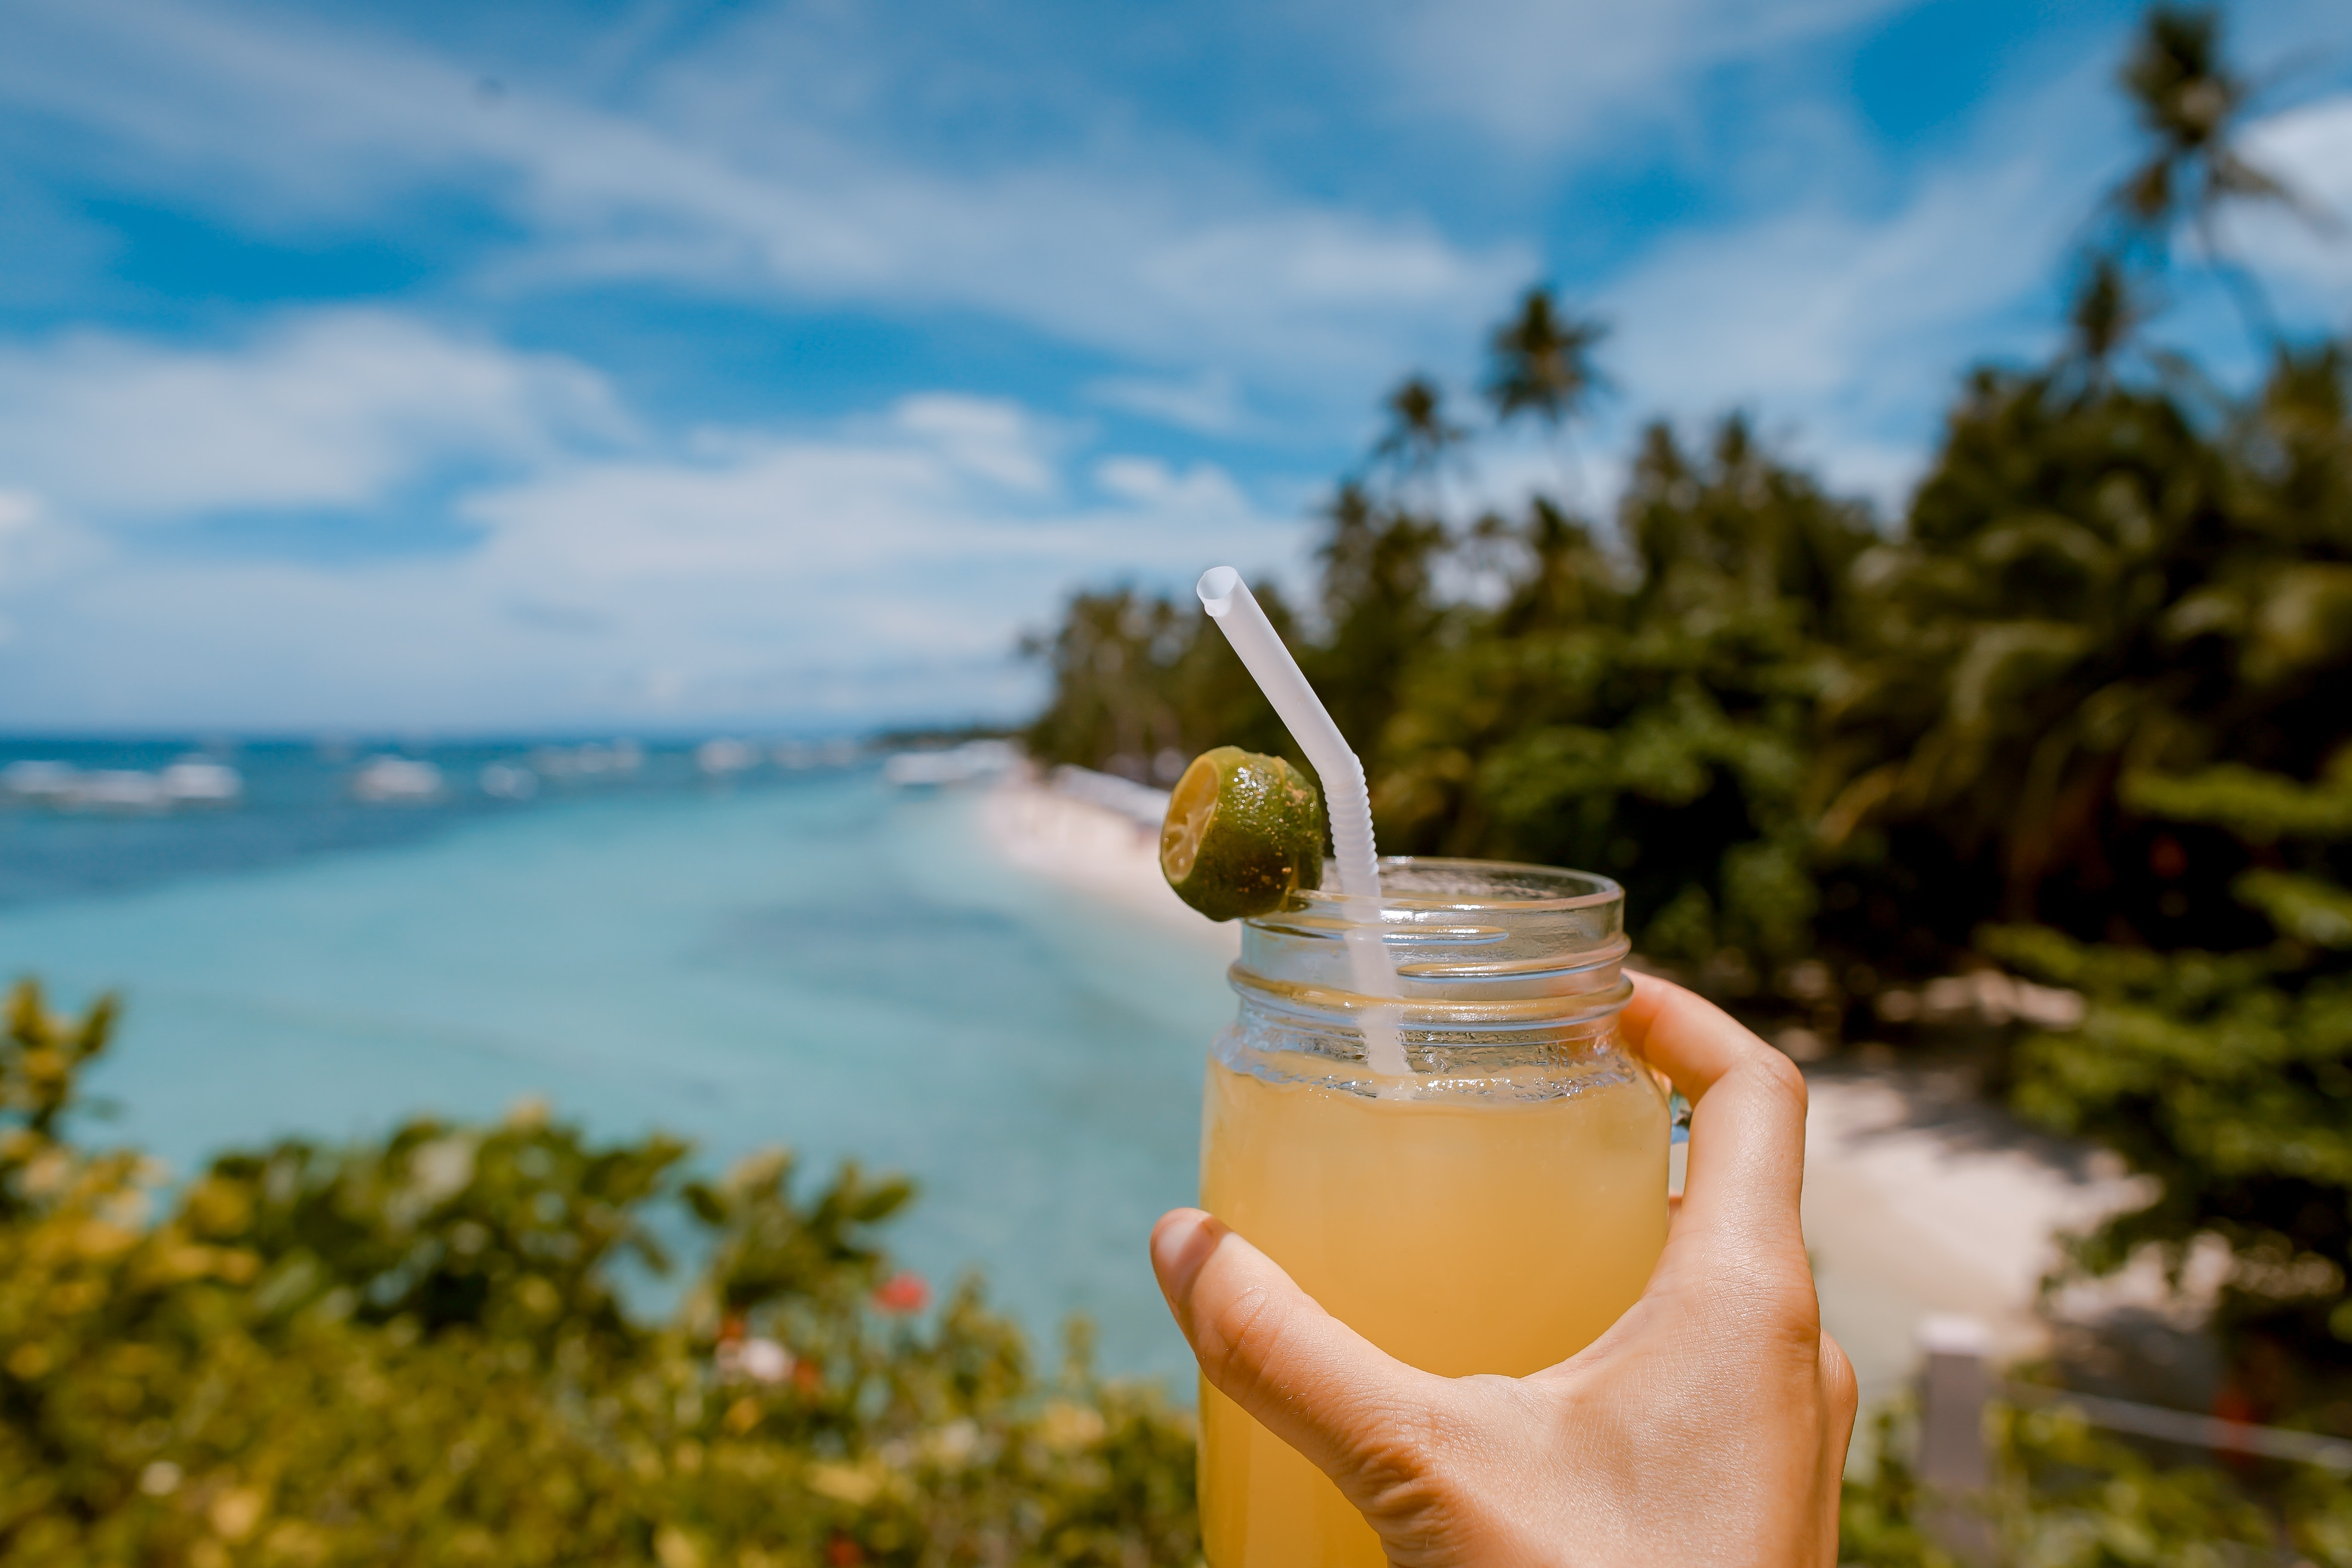 Sommer, sommerferie, planlæg, drink, drinks, ferie, sommer. (Foto: Unsplash)